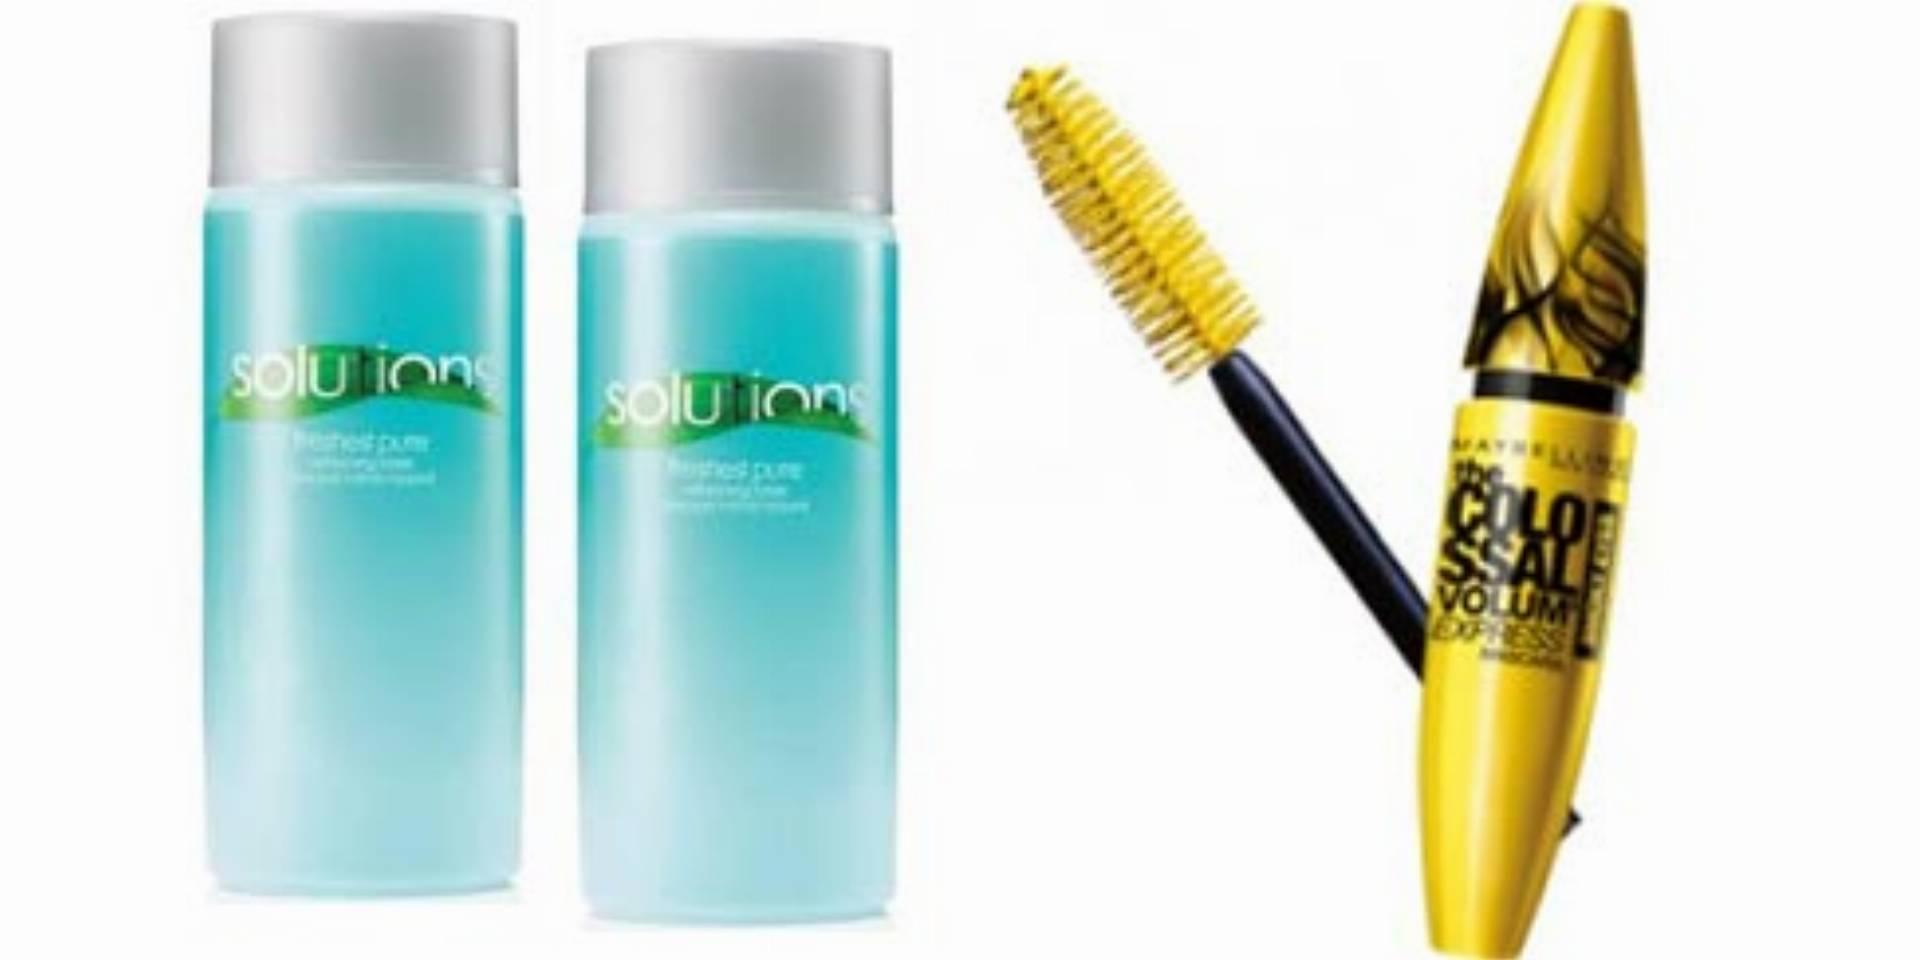 Wasze opinie: Tonik Avon Solutions oraz Maybelline Colossal Volum Express Smoky Eyes